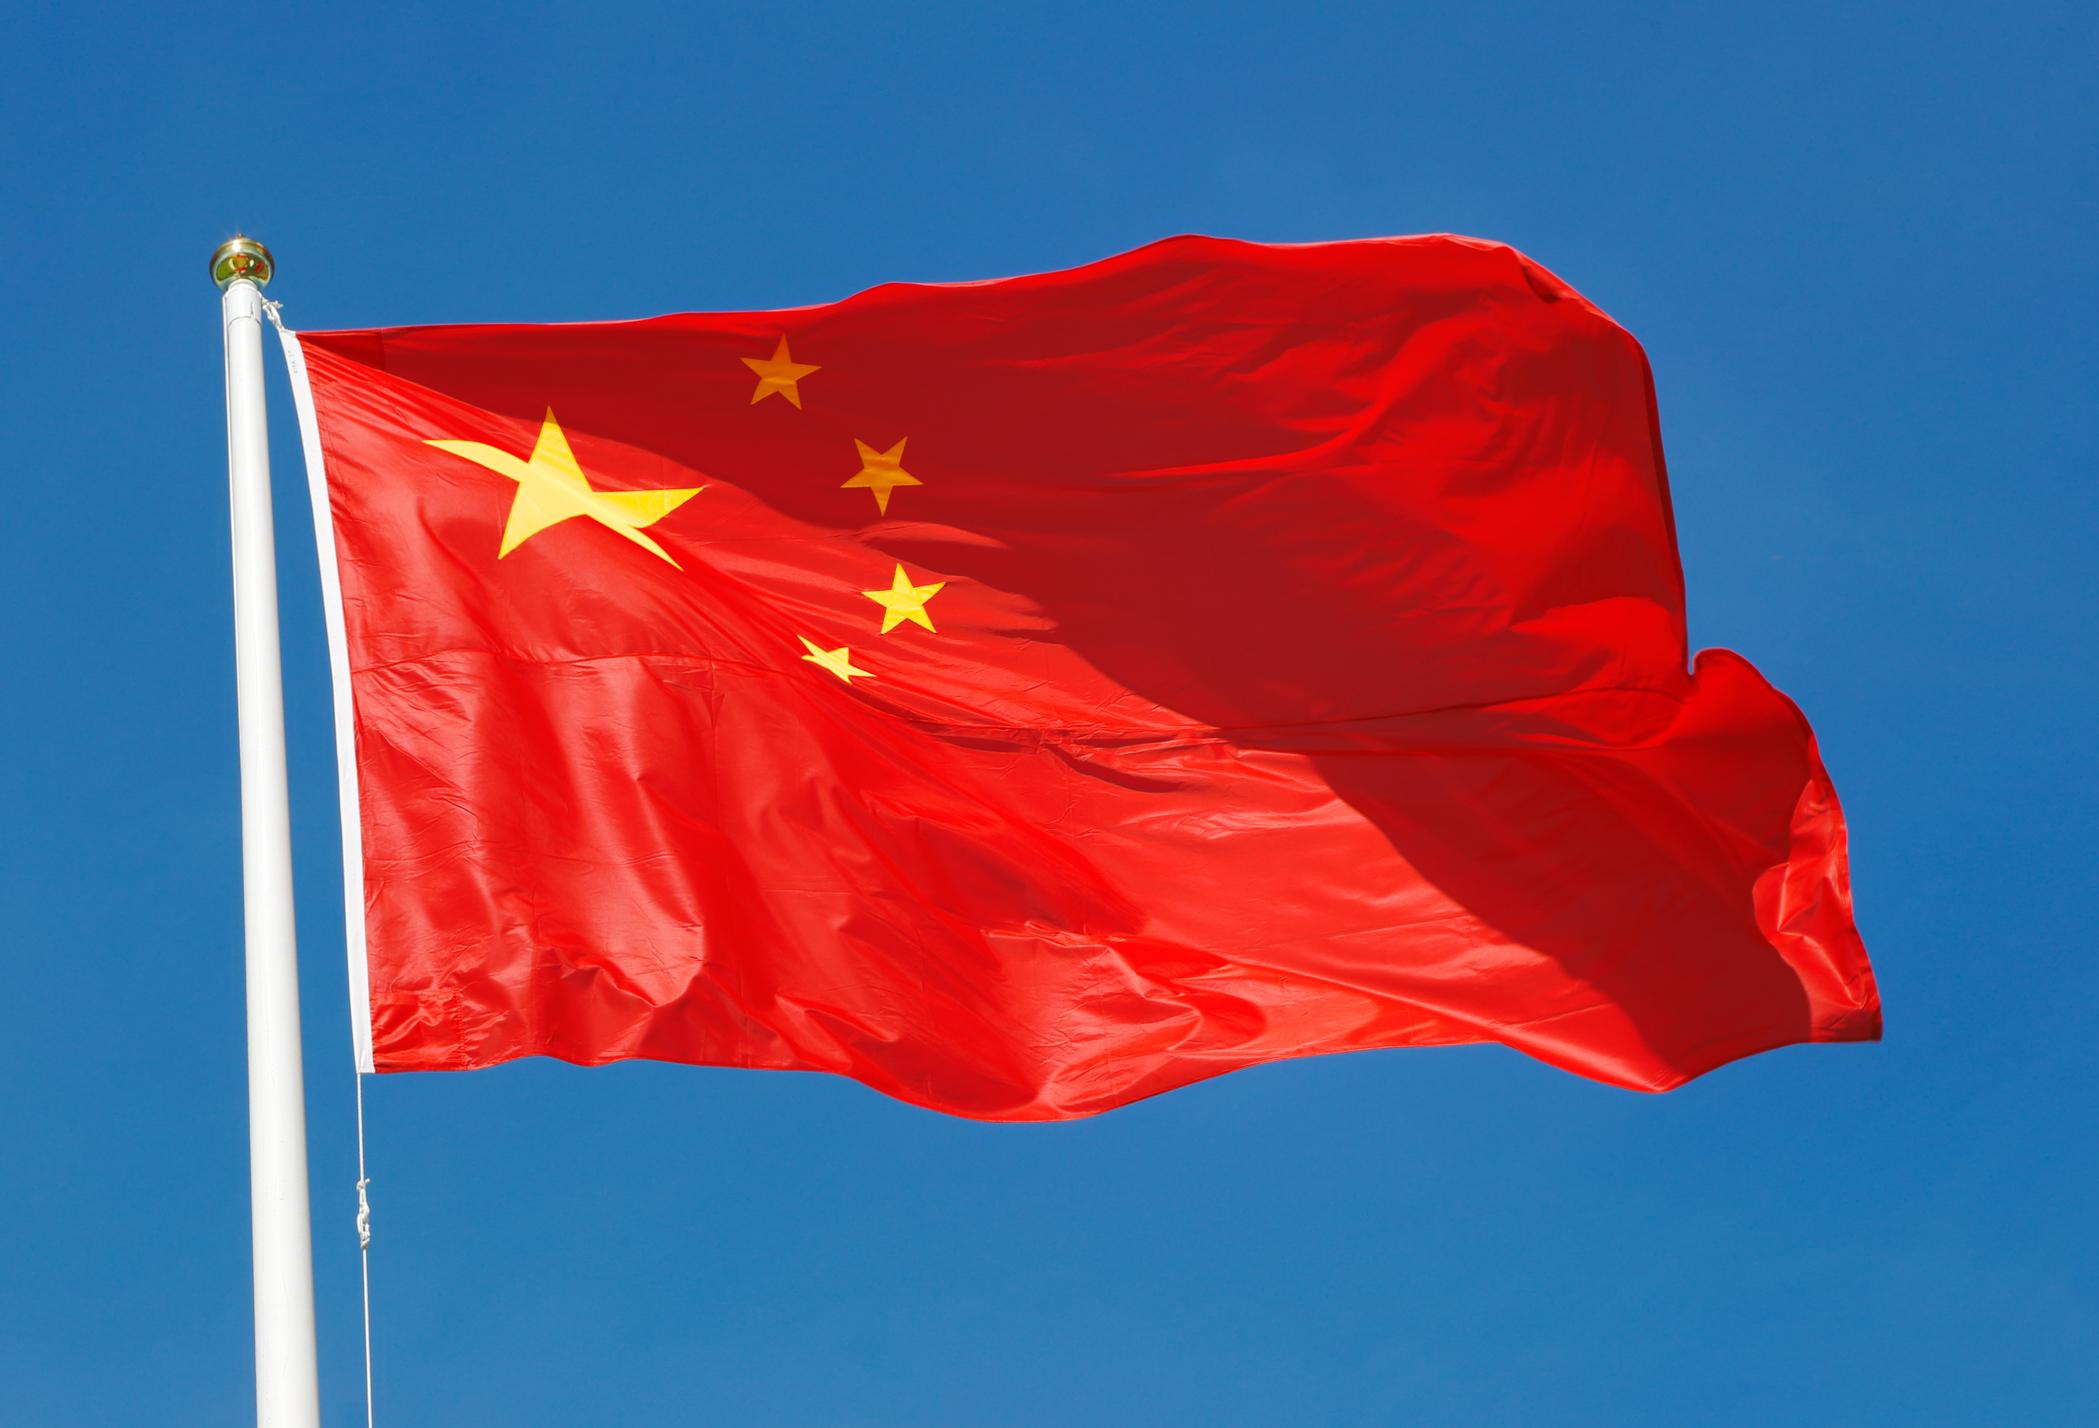 Report: China Indicates It Would Accept a U.S. Shutdown of TikTok – Motley Fool